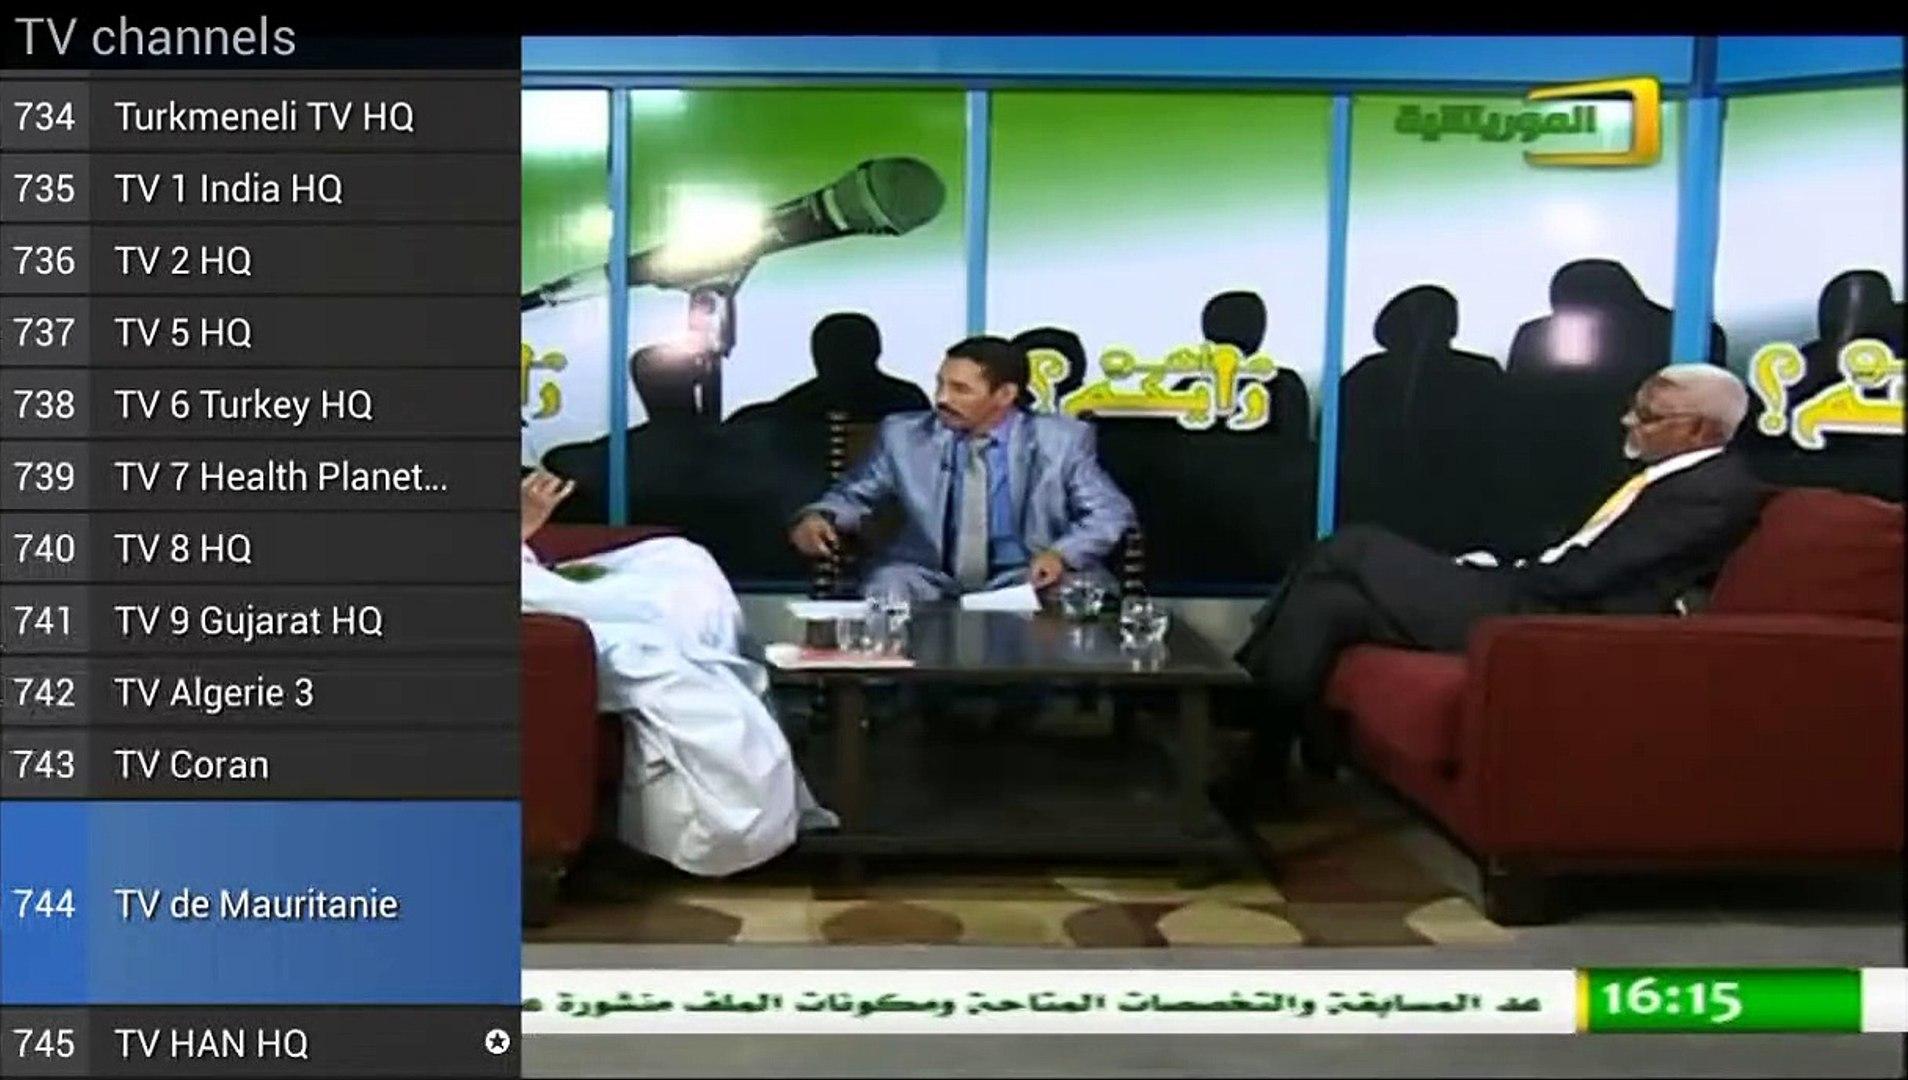 Channels from TV de Mauritanie on BestTV IPTV